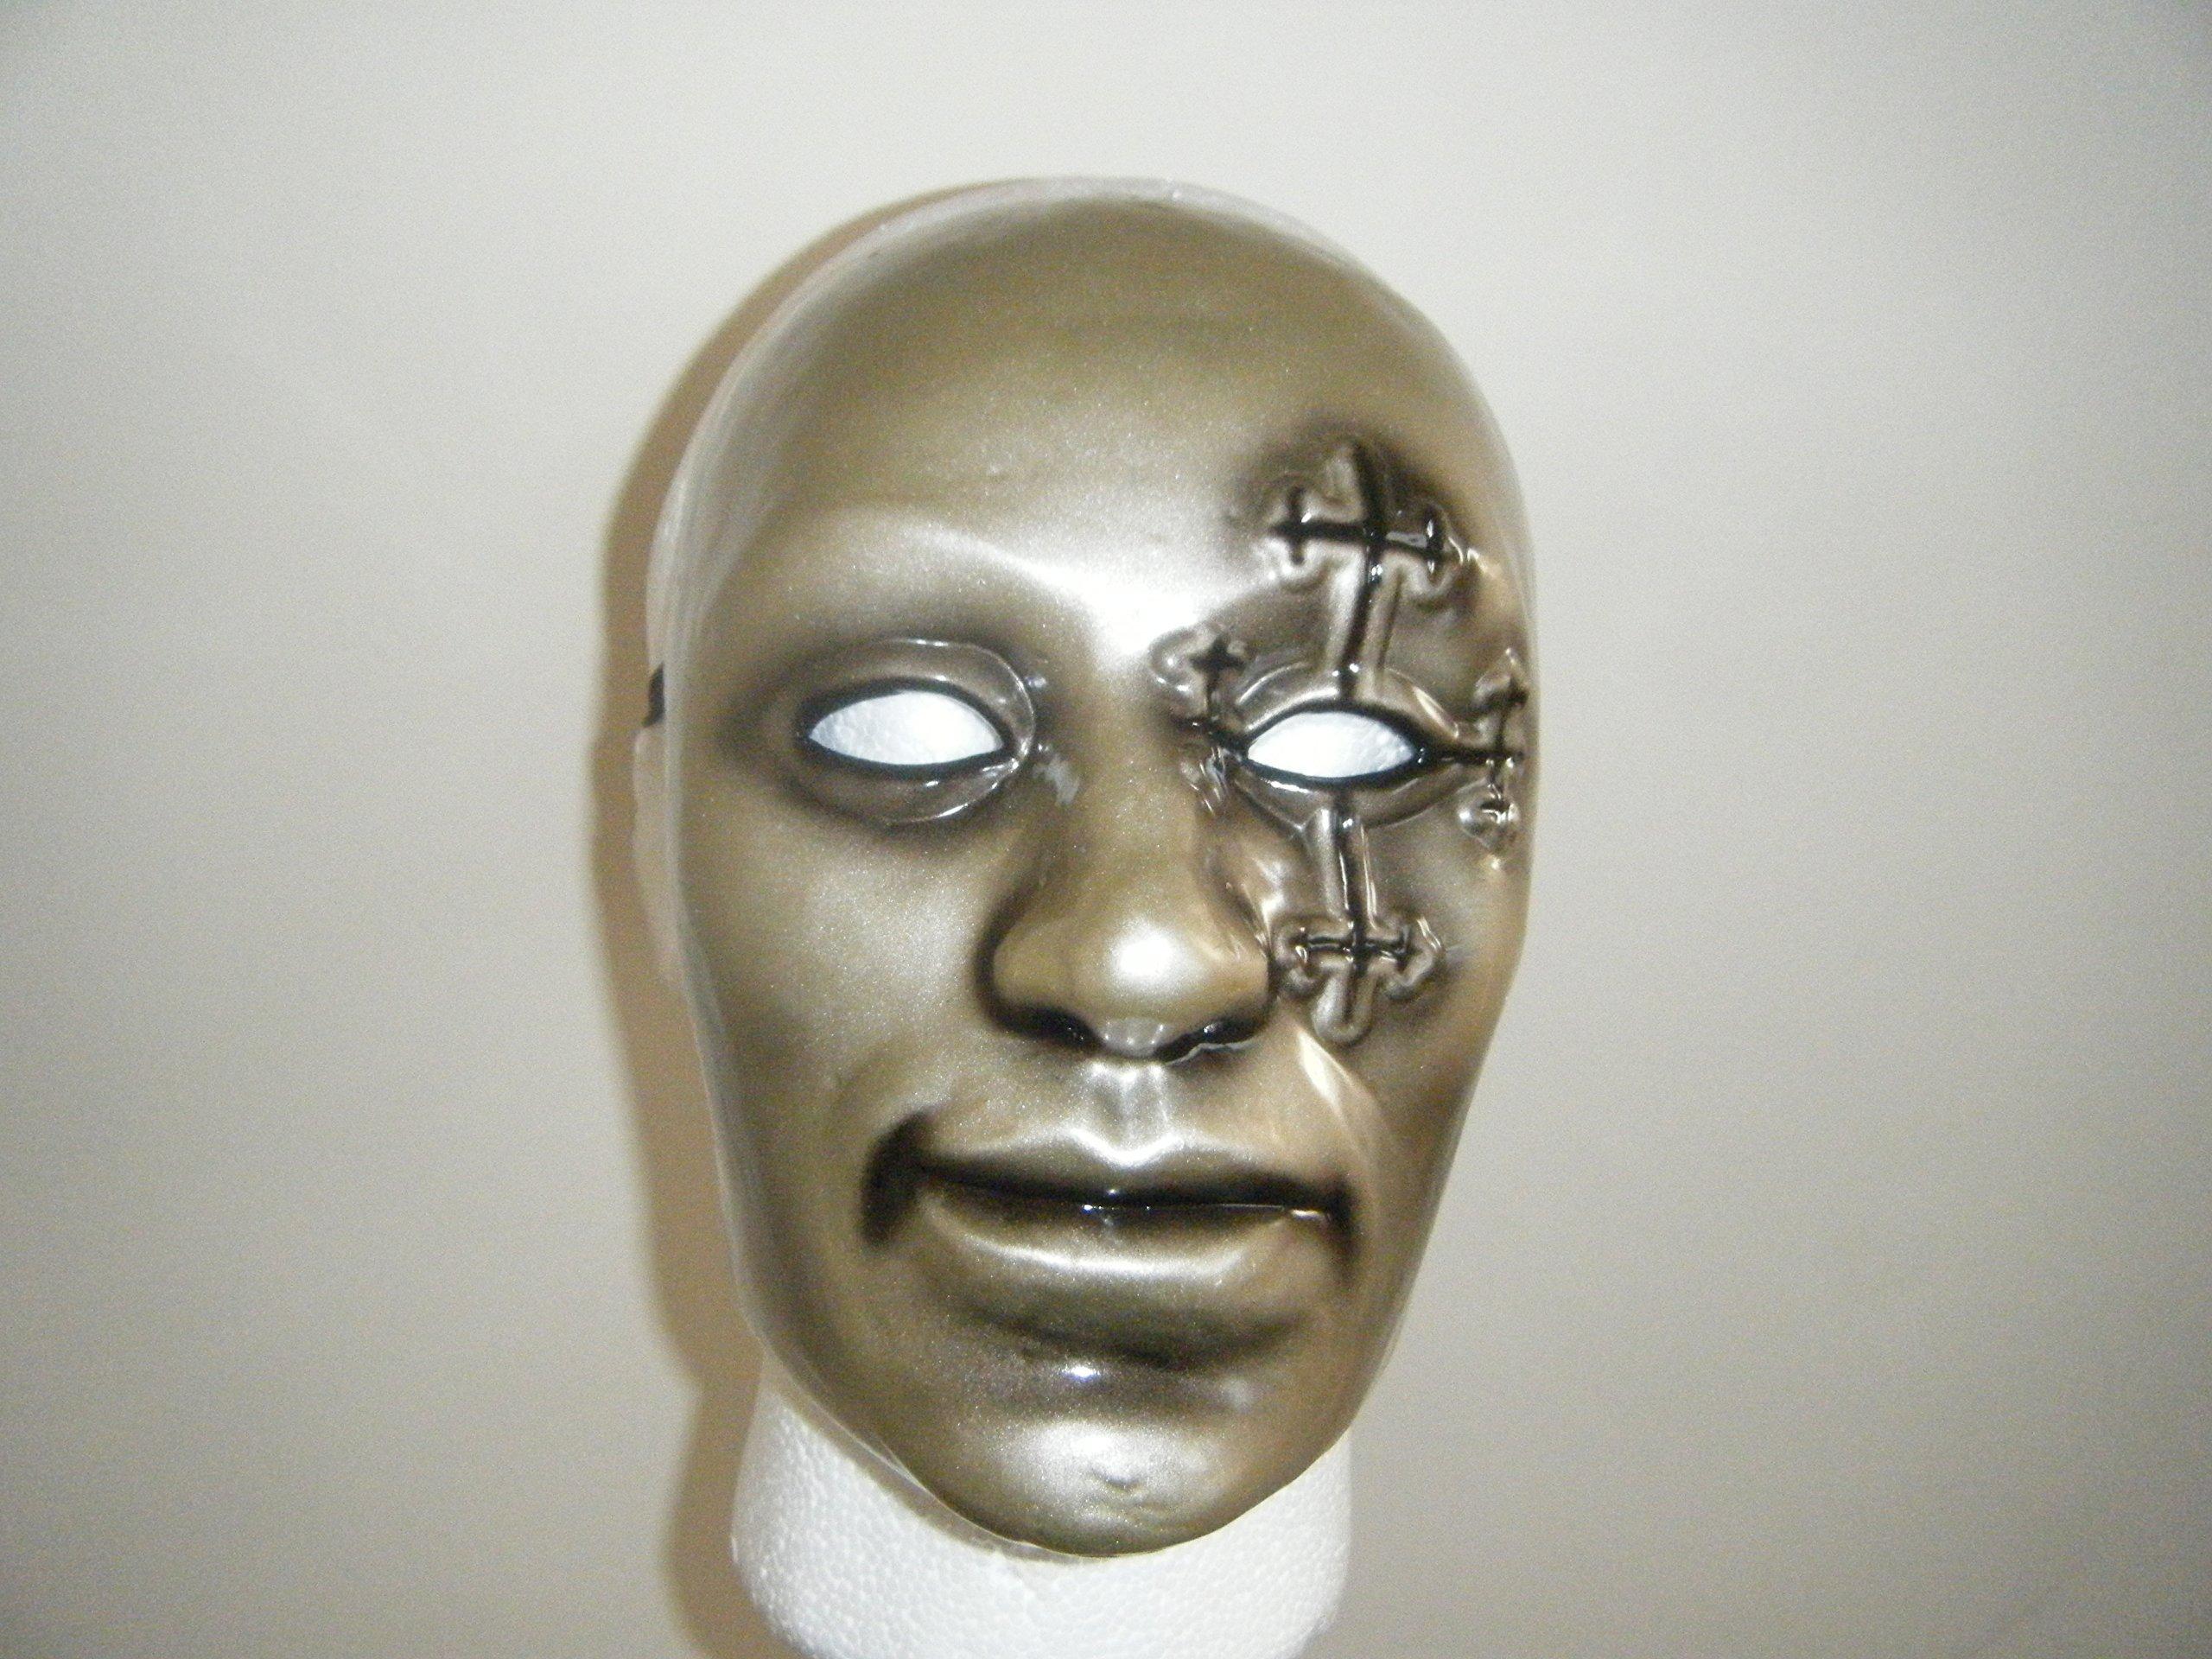 WRESTLING MASKS UK Men's Danny Boy Hollywood Undead Style Mask One Size Multicoloured by Wrestling